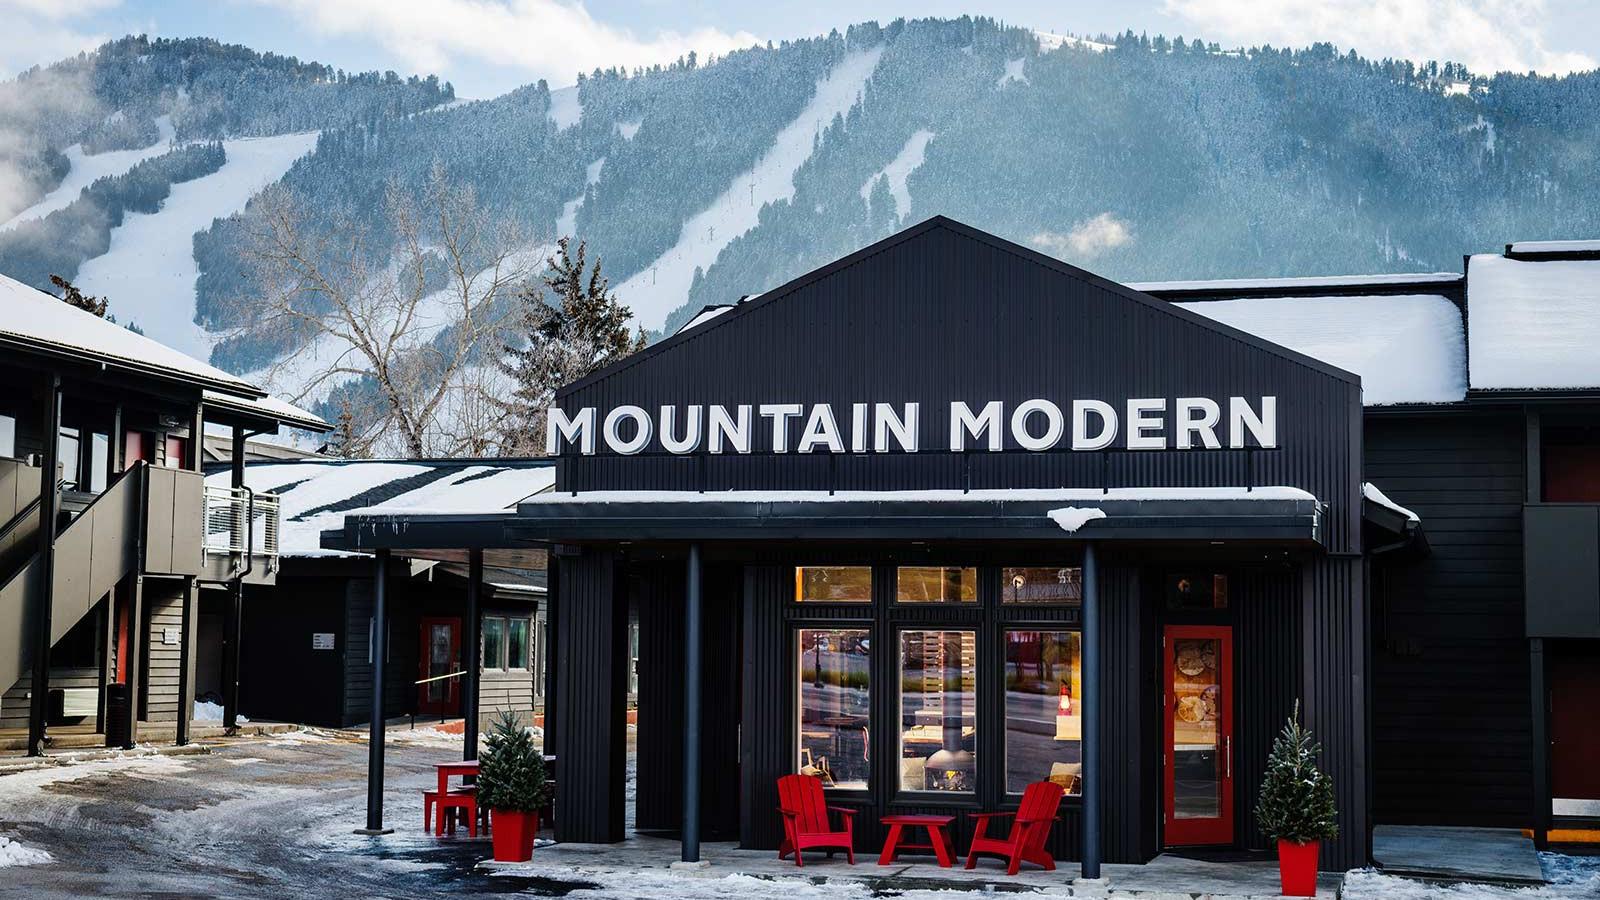 Mountain Modern Motel, Jackson Hole - Exterior - Winter